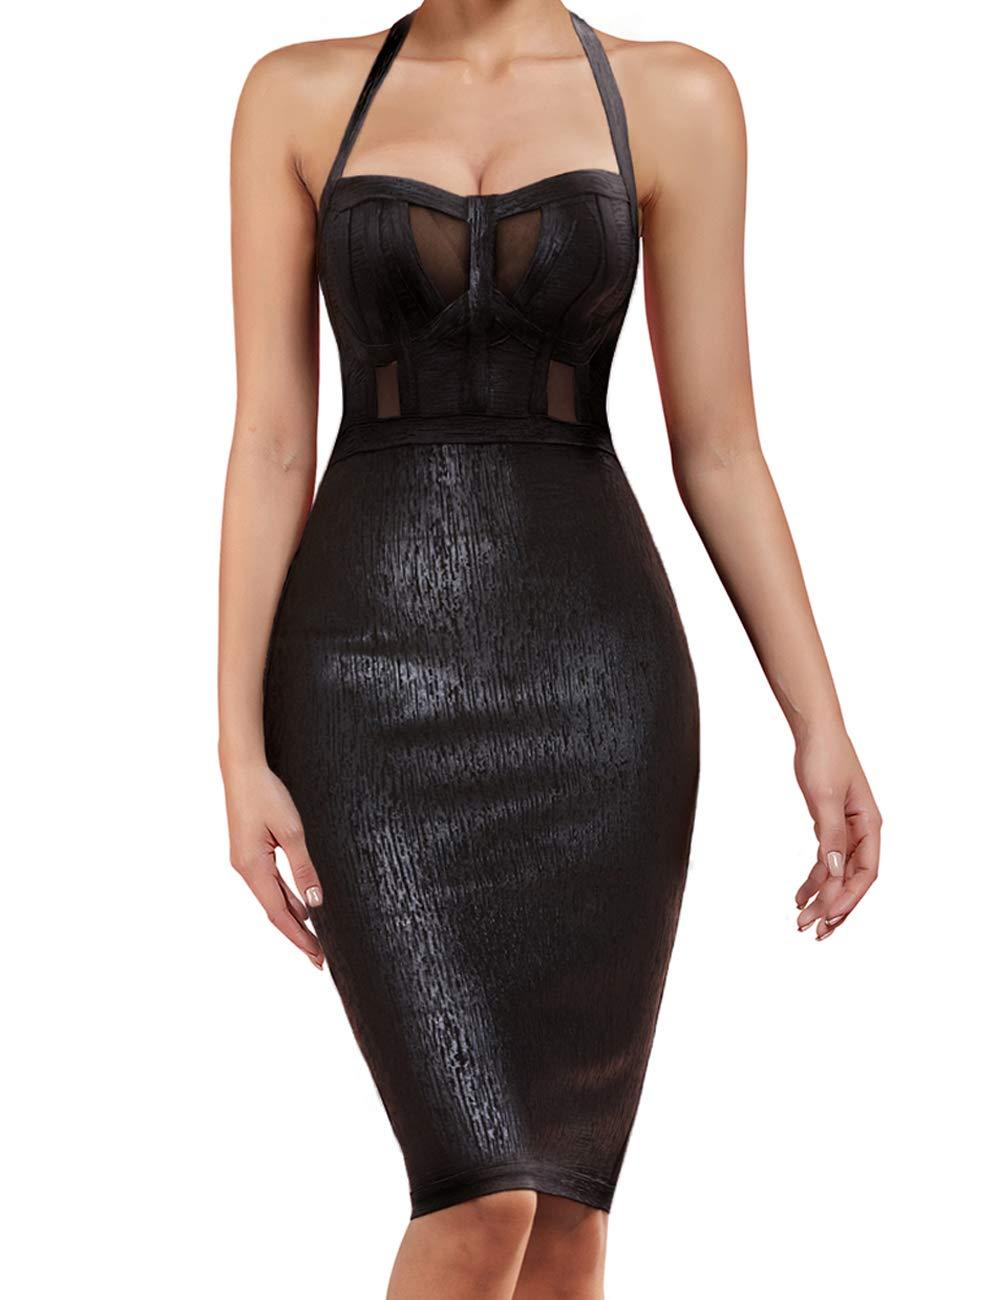 UONBOX Women's Sexy Rayon Halter Strapless Foil Sheer Mesh Bodycon Bandage Dress Black